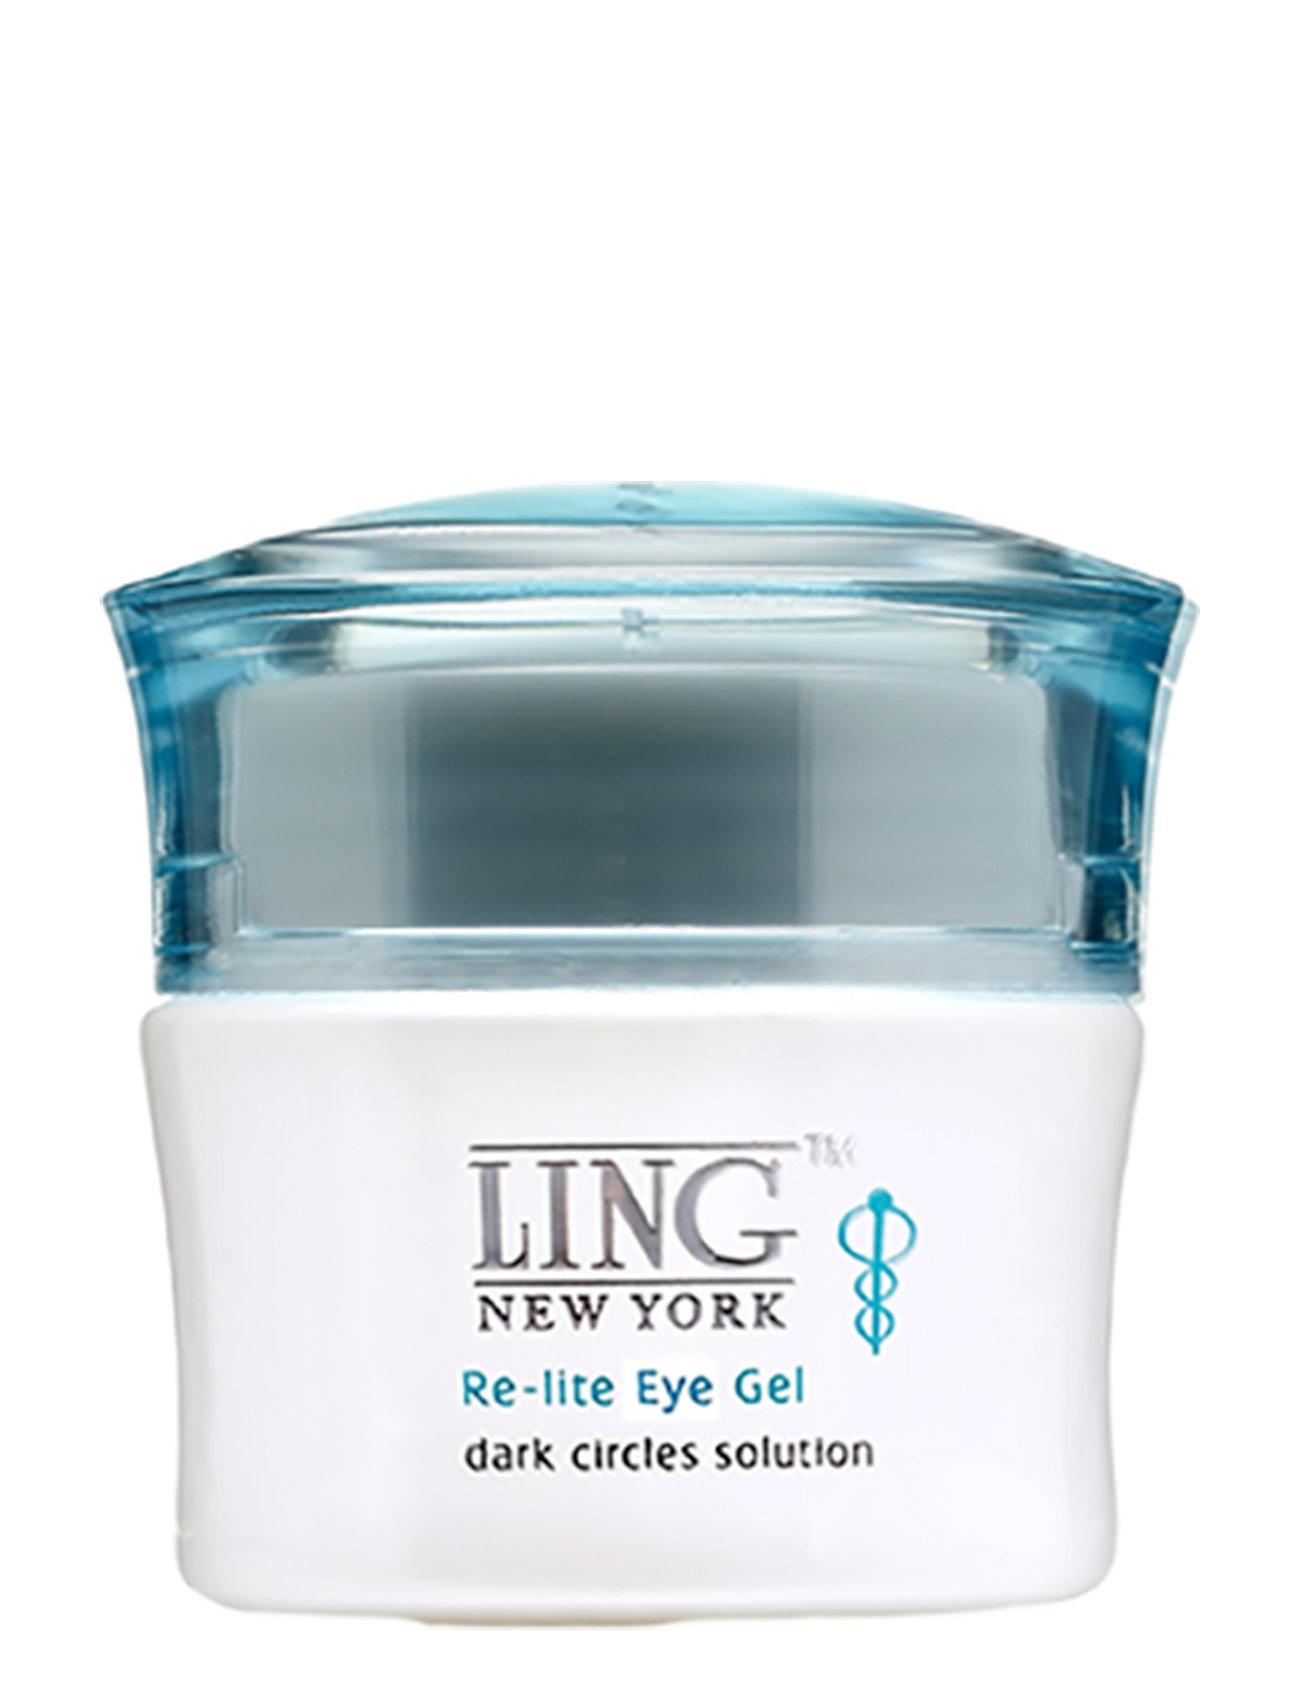 LING New York Re-Lite Eye Gel - dark circles solution - CLEAR